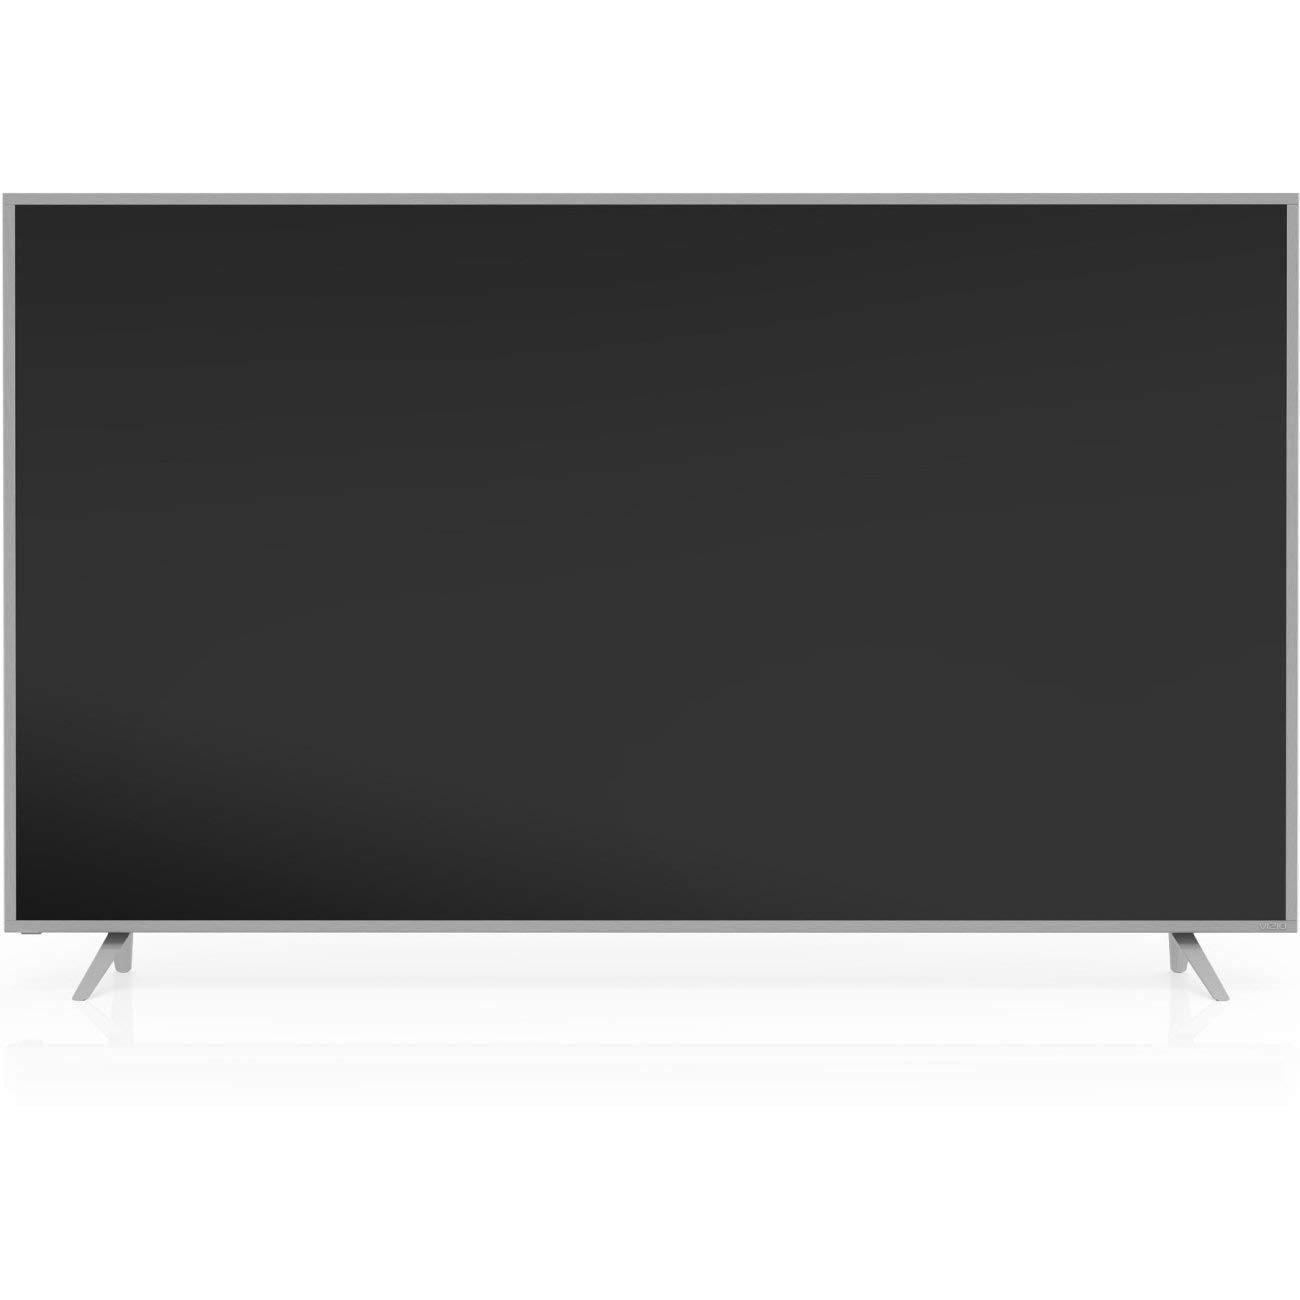 An image of VIZIO E-Series VIPRB-E65-E3 65-Inch HDR 4K LED 120Hz TV | Your TV Set